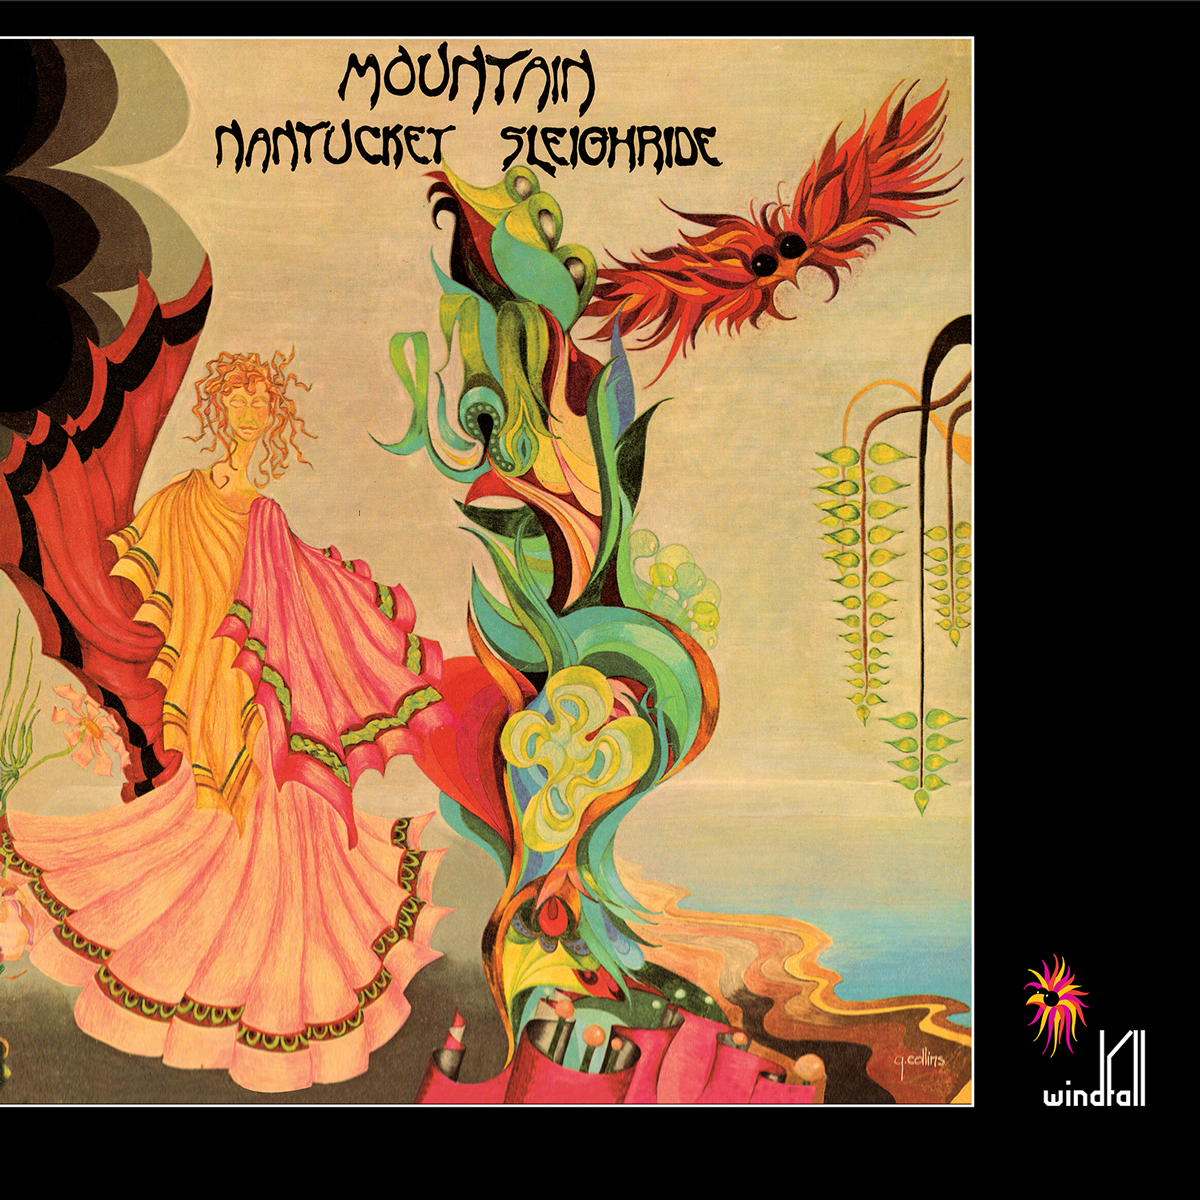 Mountain - Nantucket Sleighride (180 Gram Audiophile Clear Vinyl/Limited Edition/Gatefold Cover)